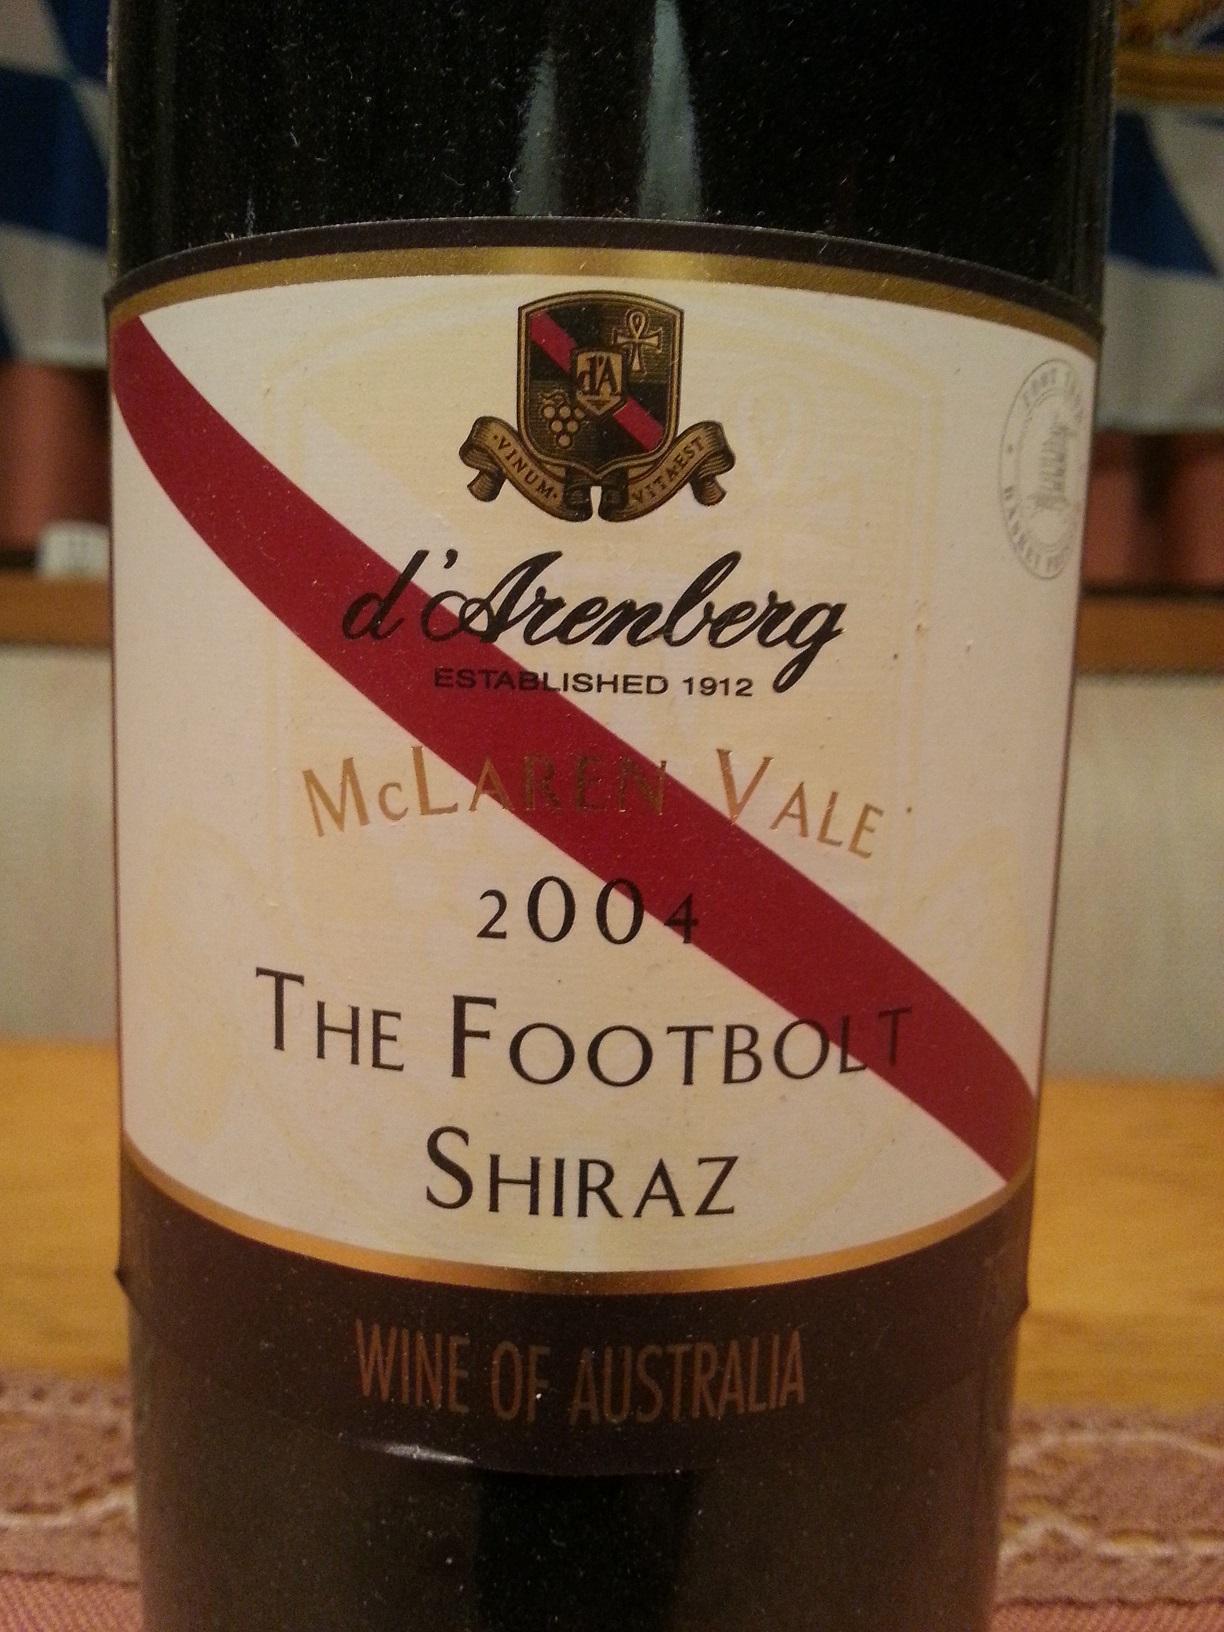 2004 The Footbolt Shiraz | d'Arenberg